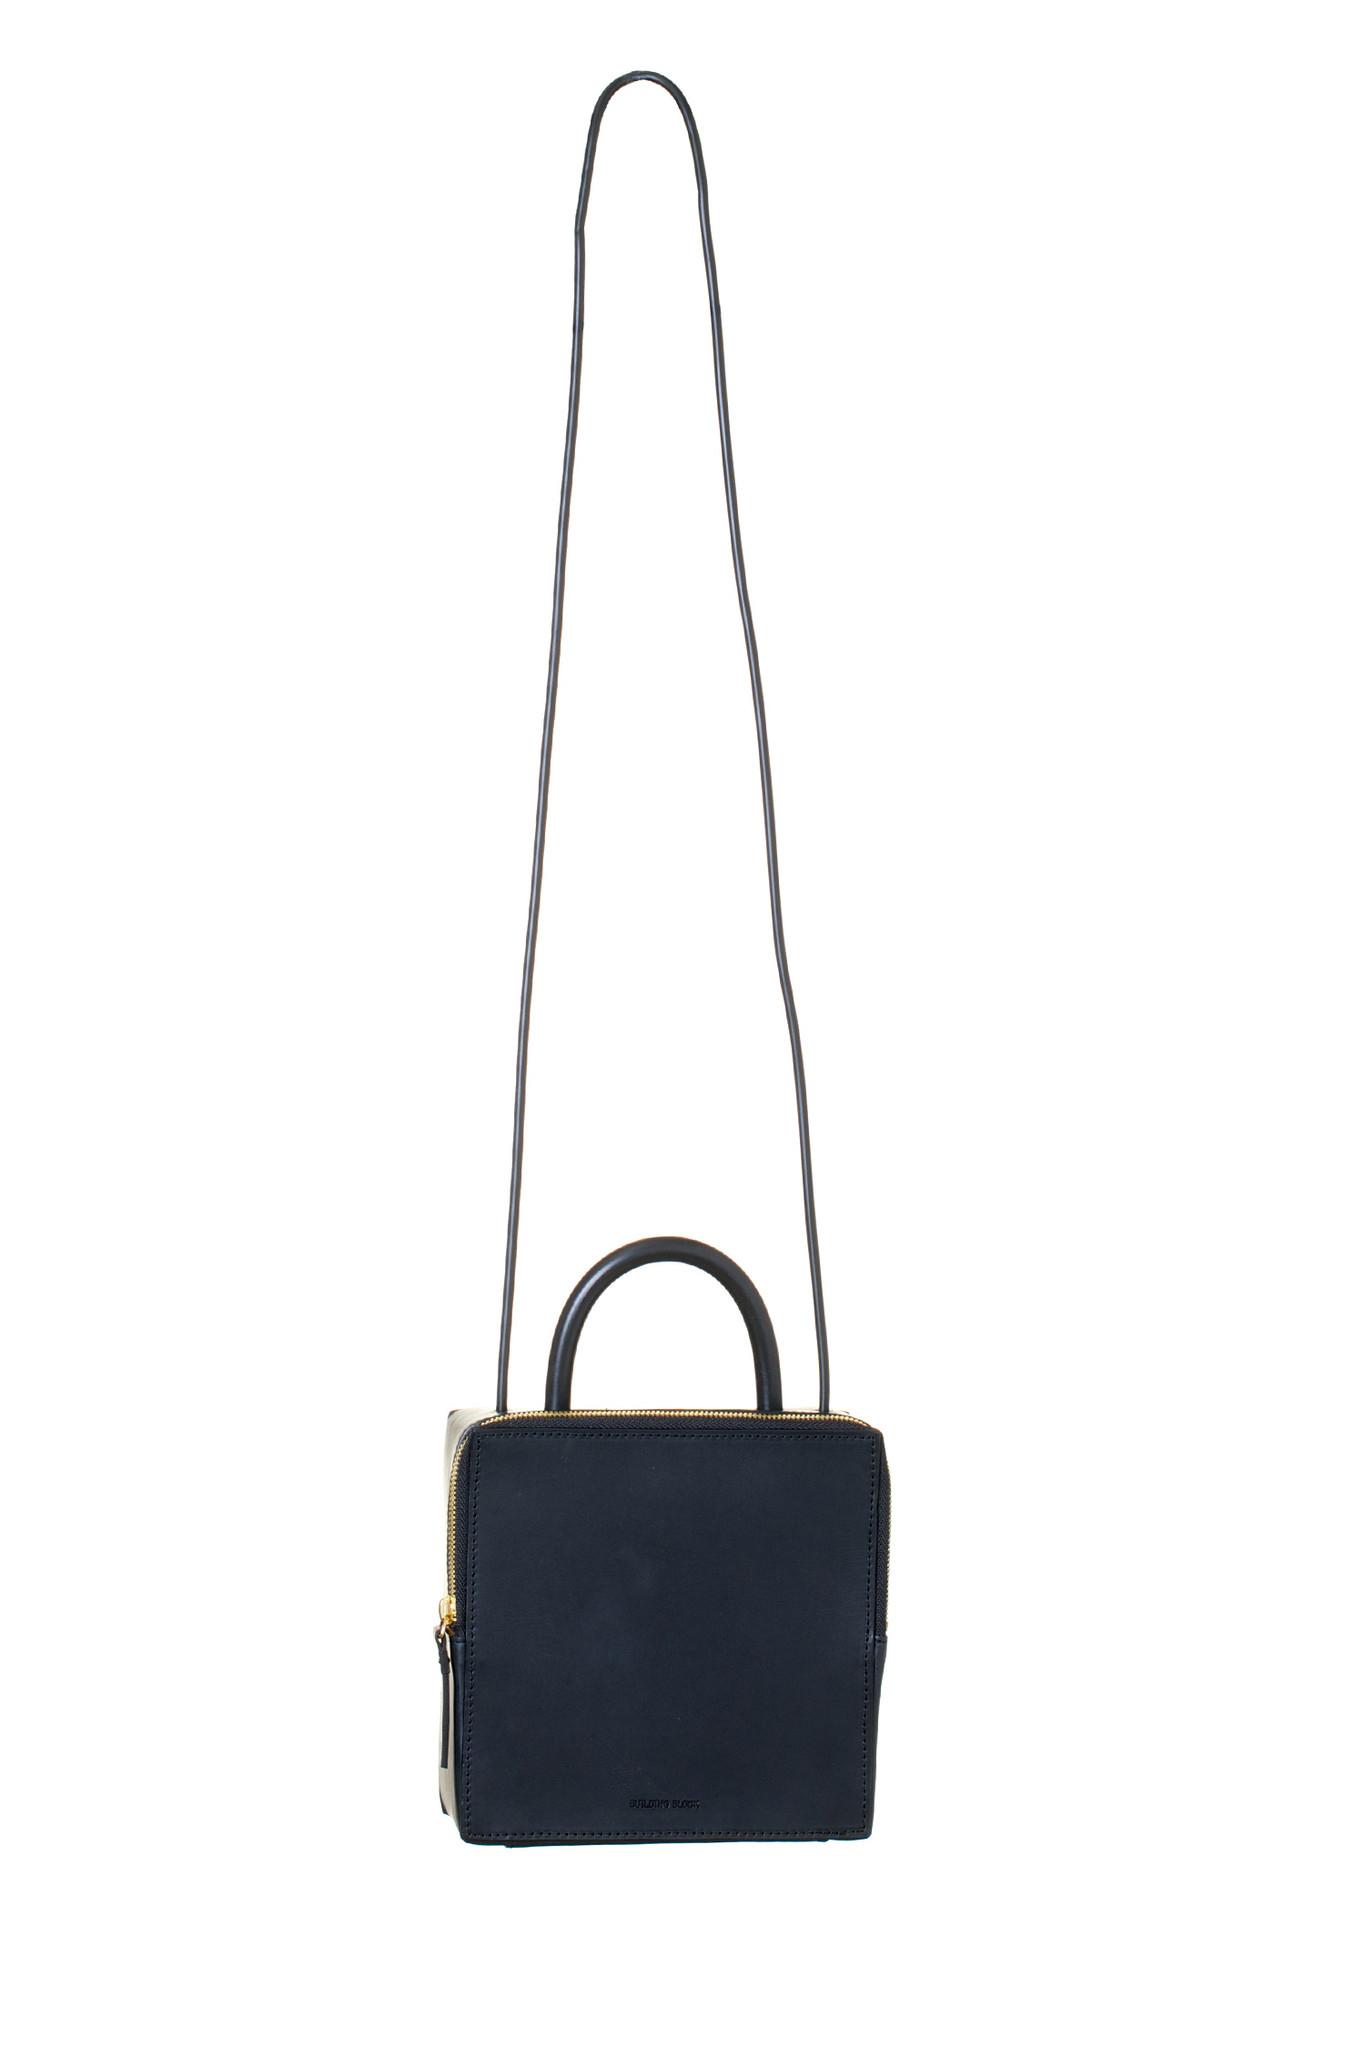 da90453d6d96 Building block Leather Box Bag - Black in Black